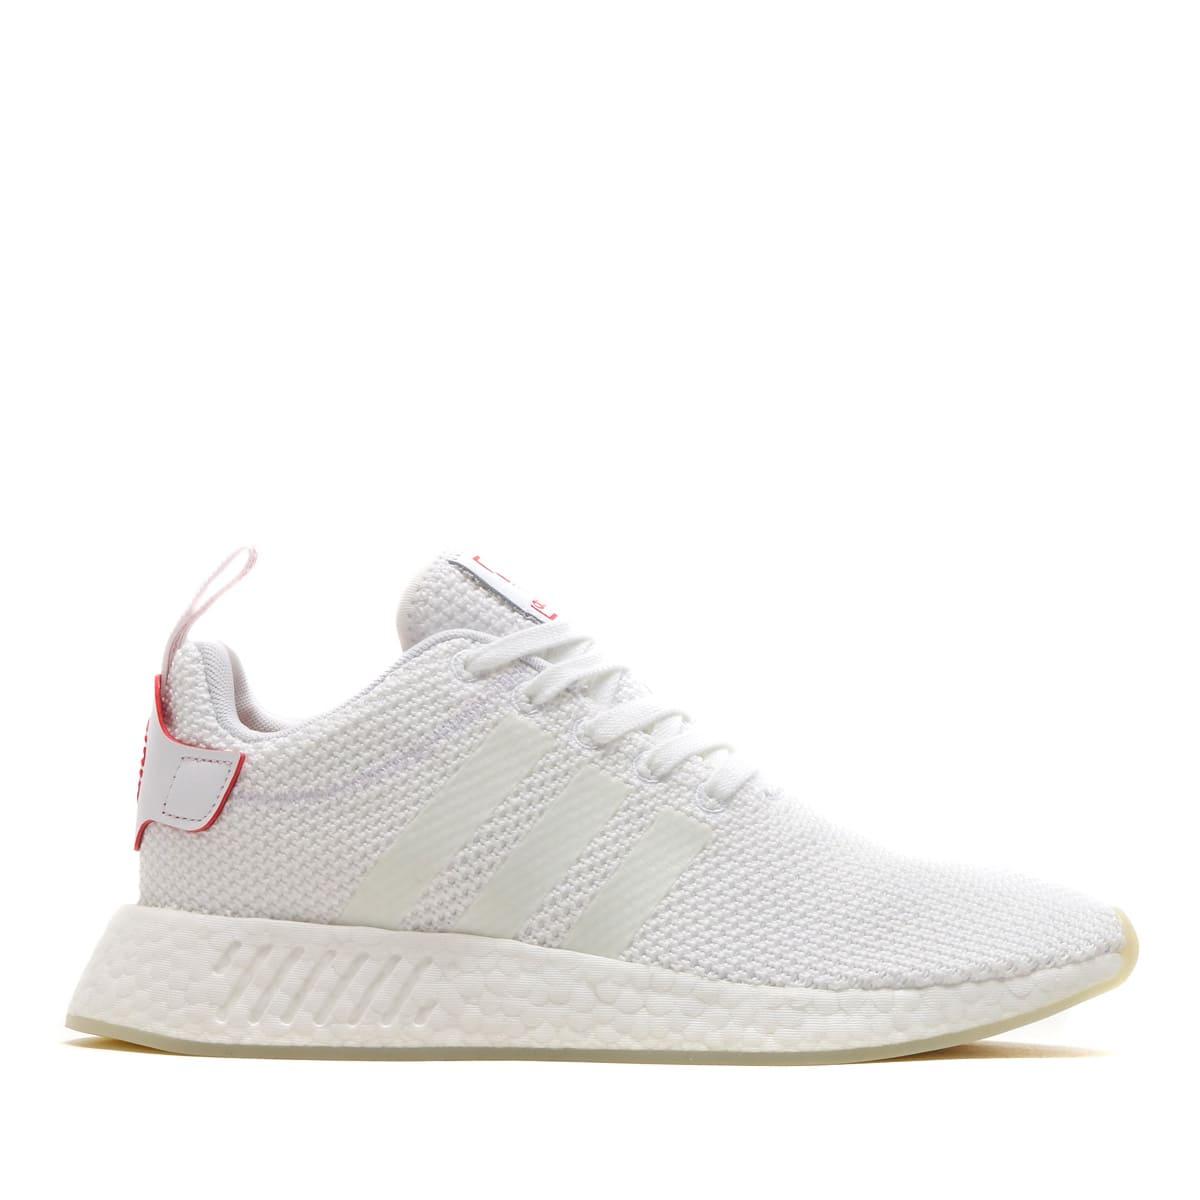 ee95517fa adidas Originals NMD R2 CNY Running White Running White Scarlet